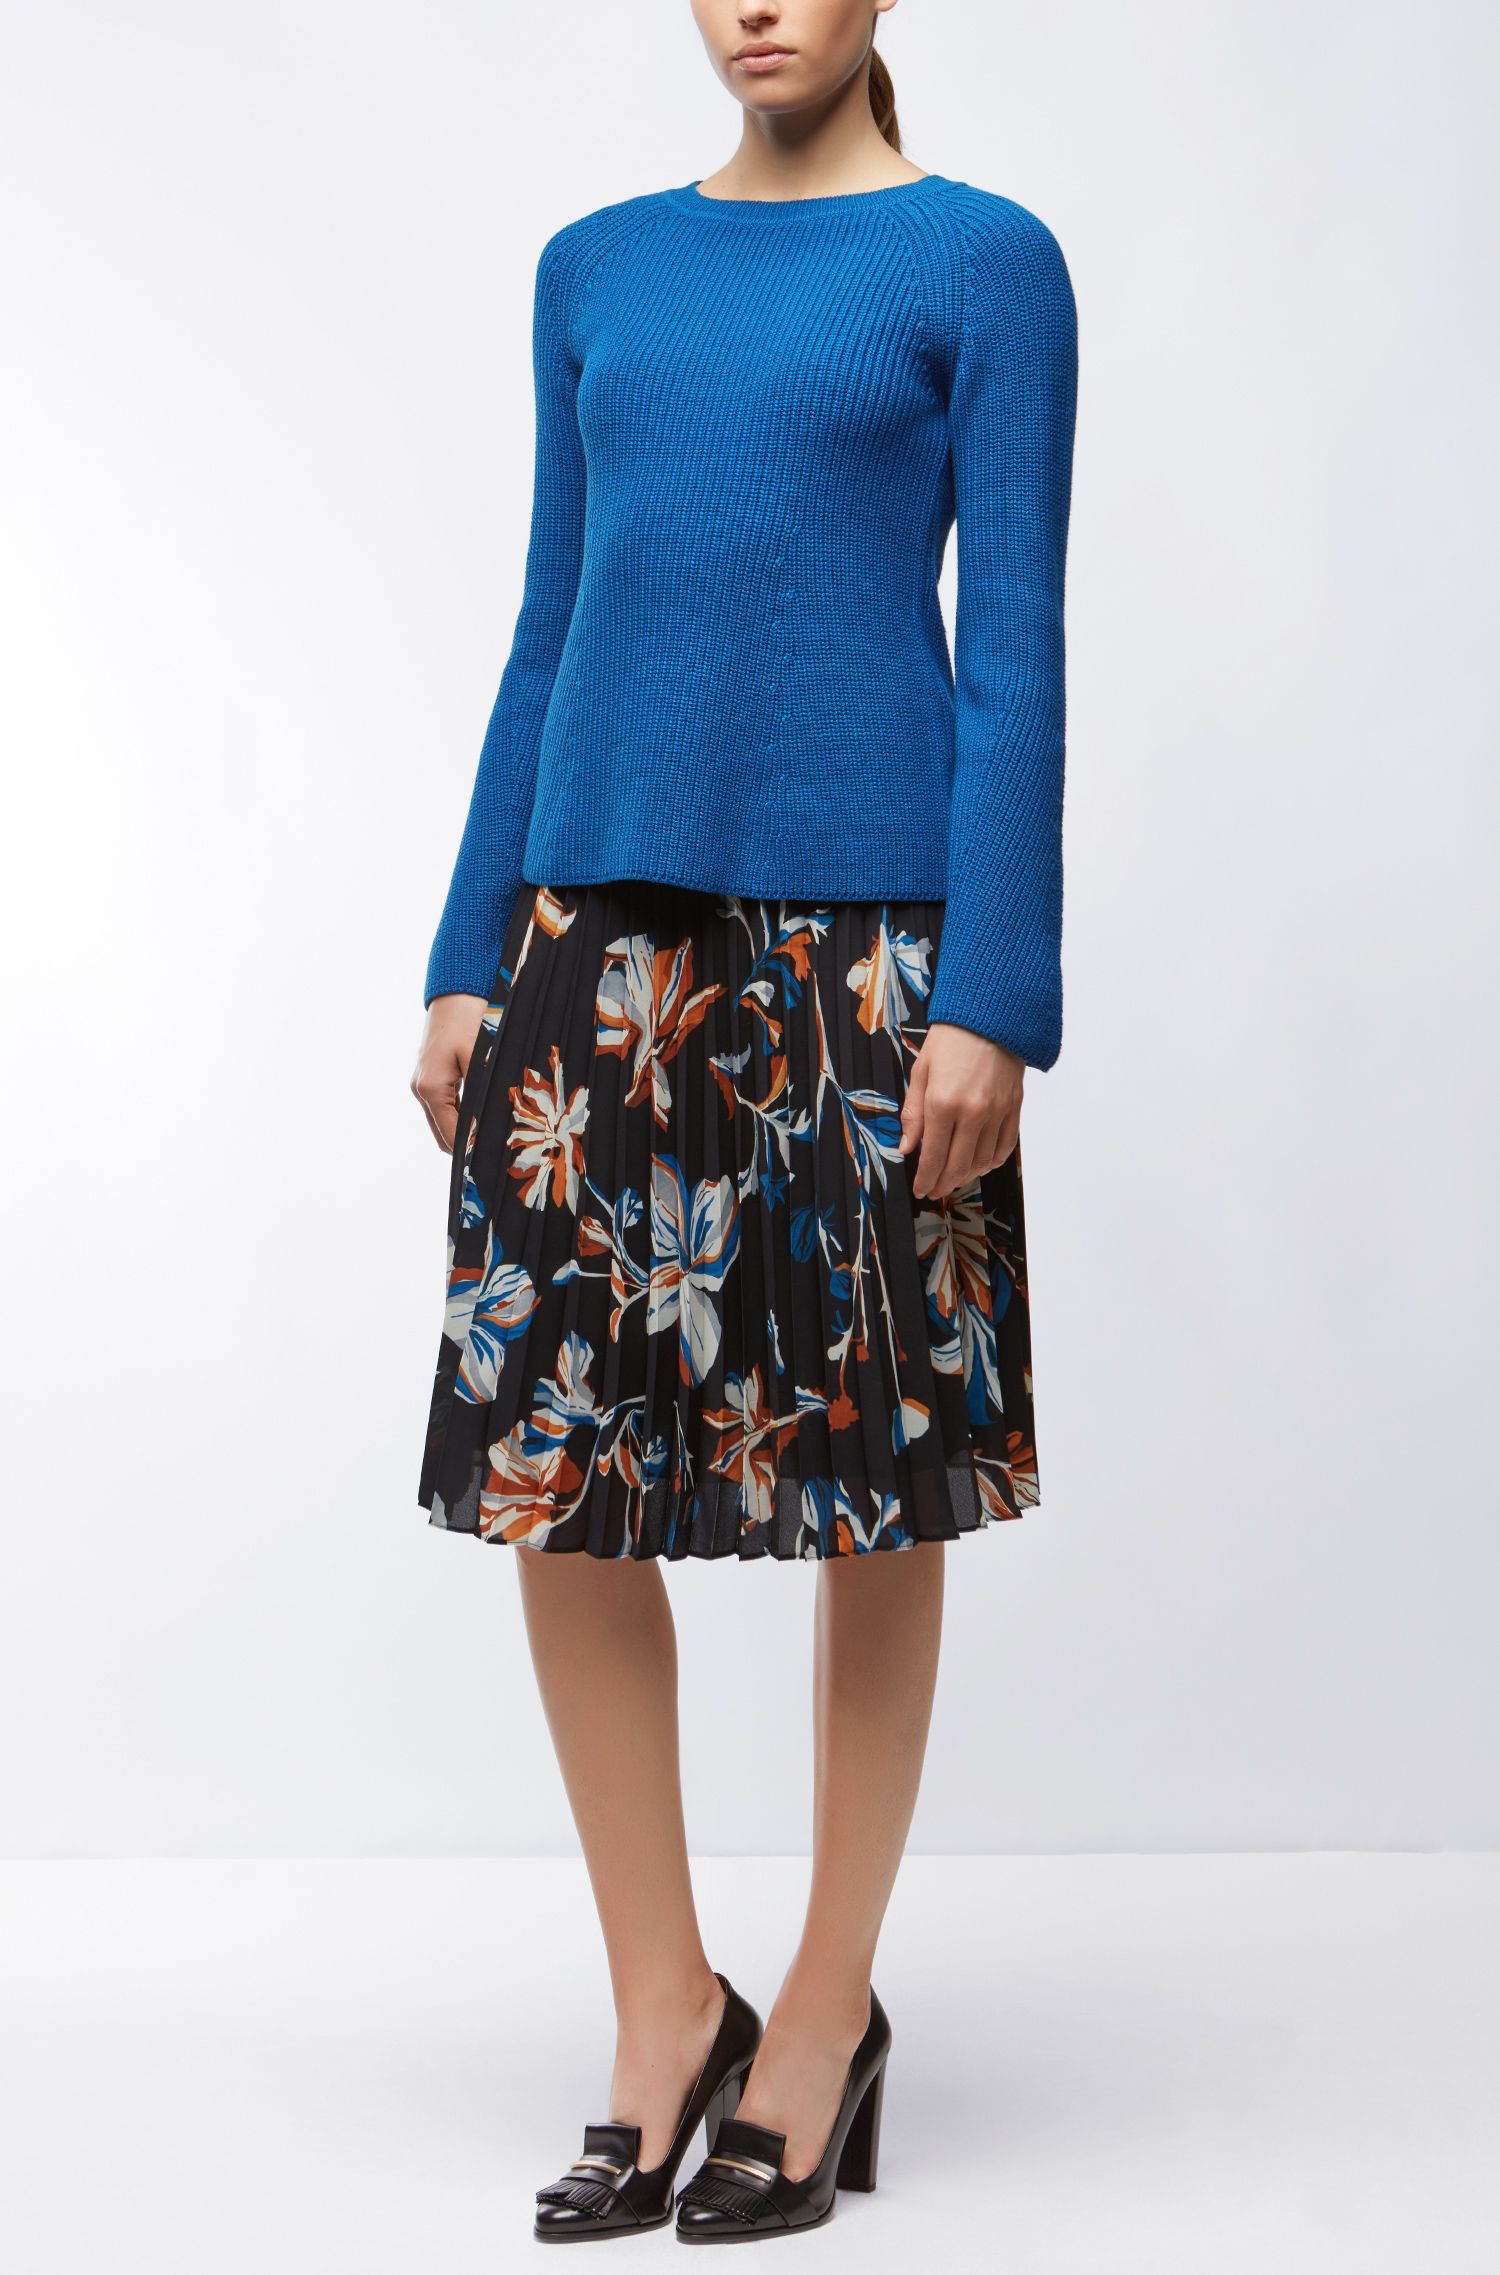 Cotton Blend Rib-Knit Sweater | Foya